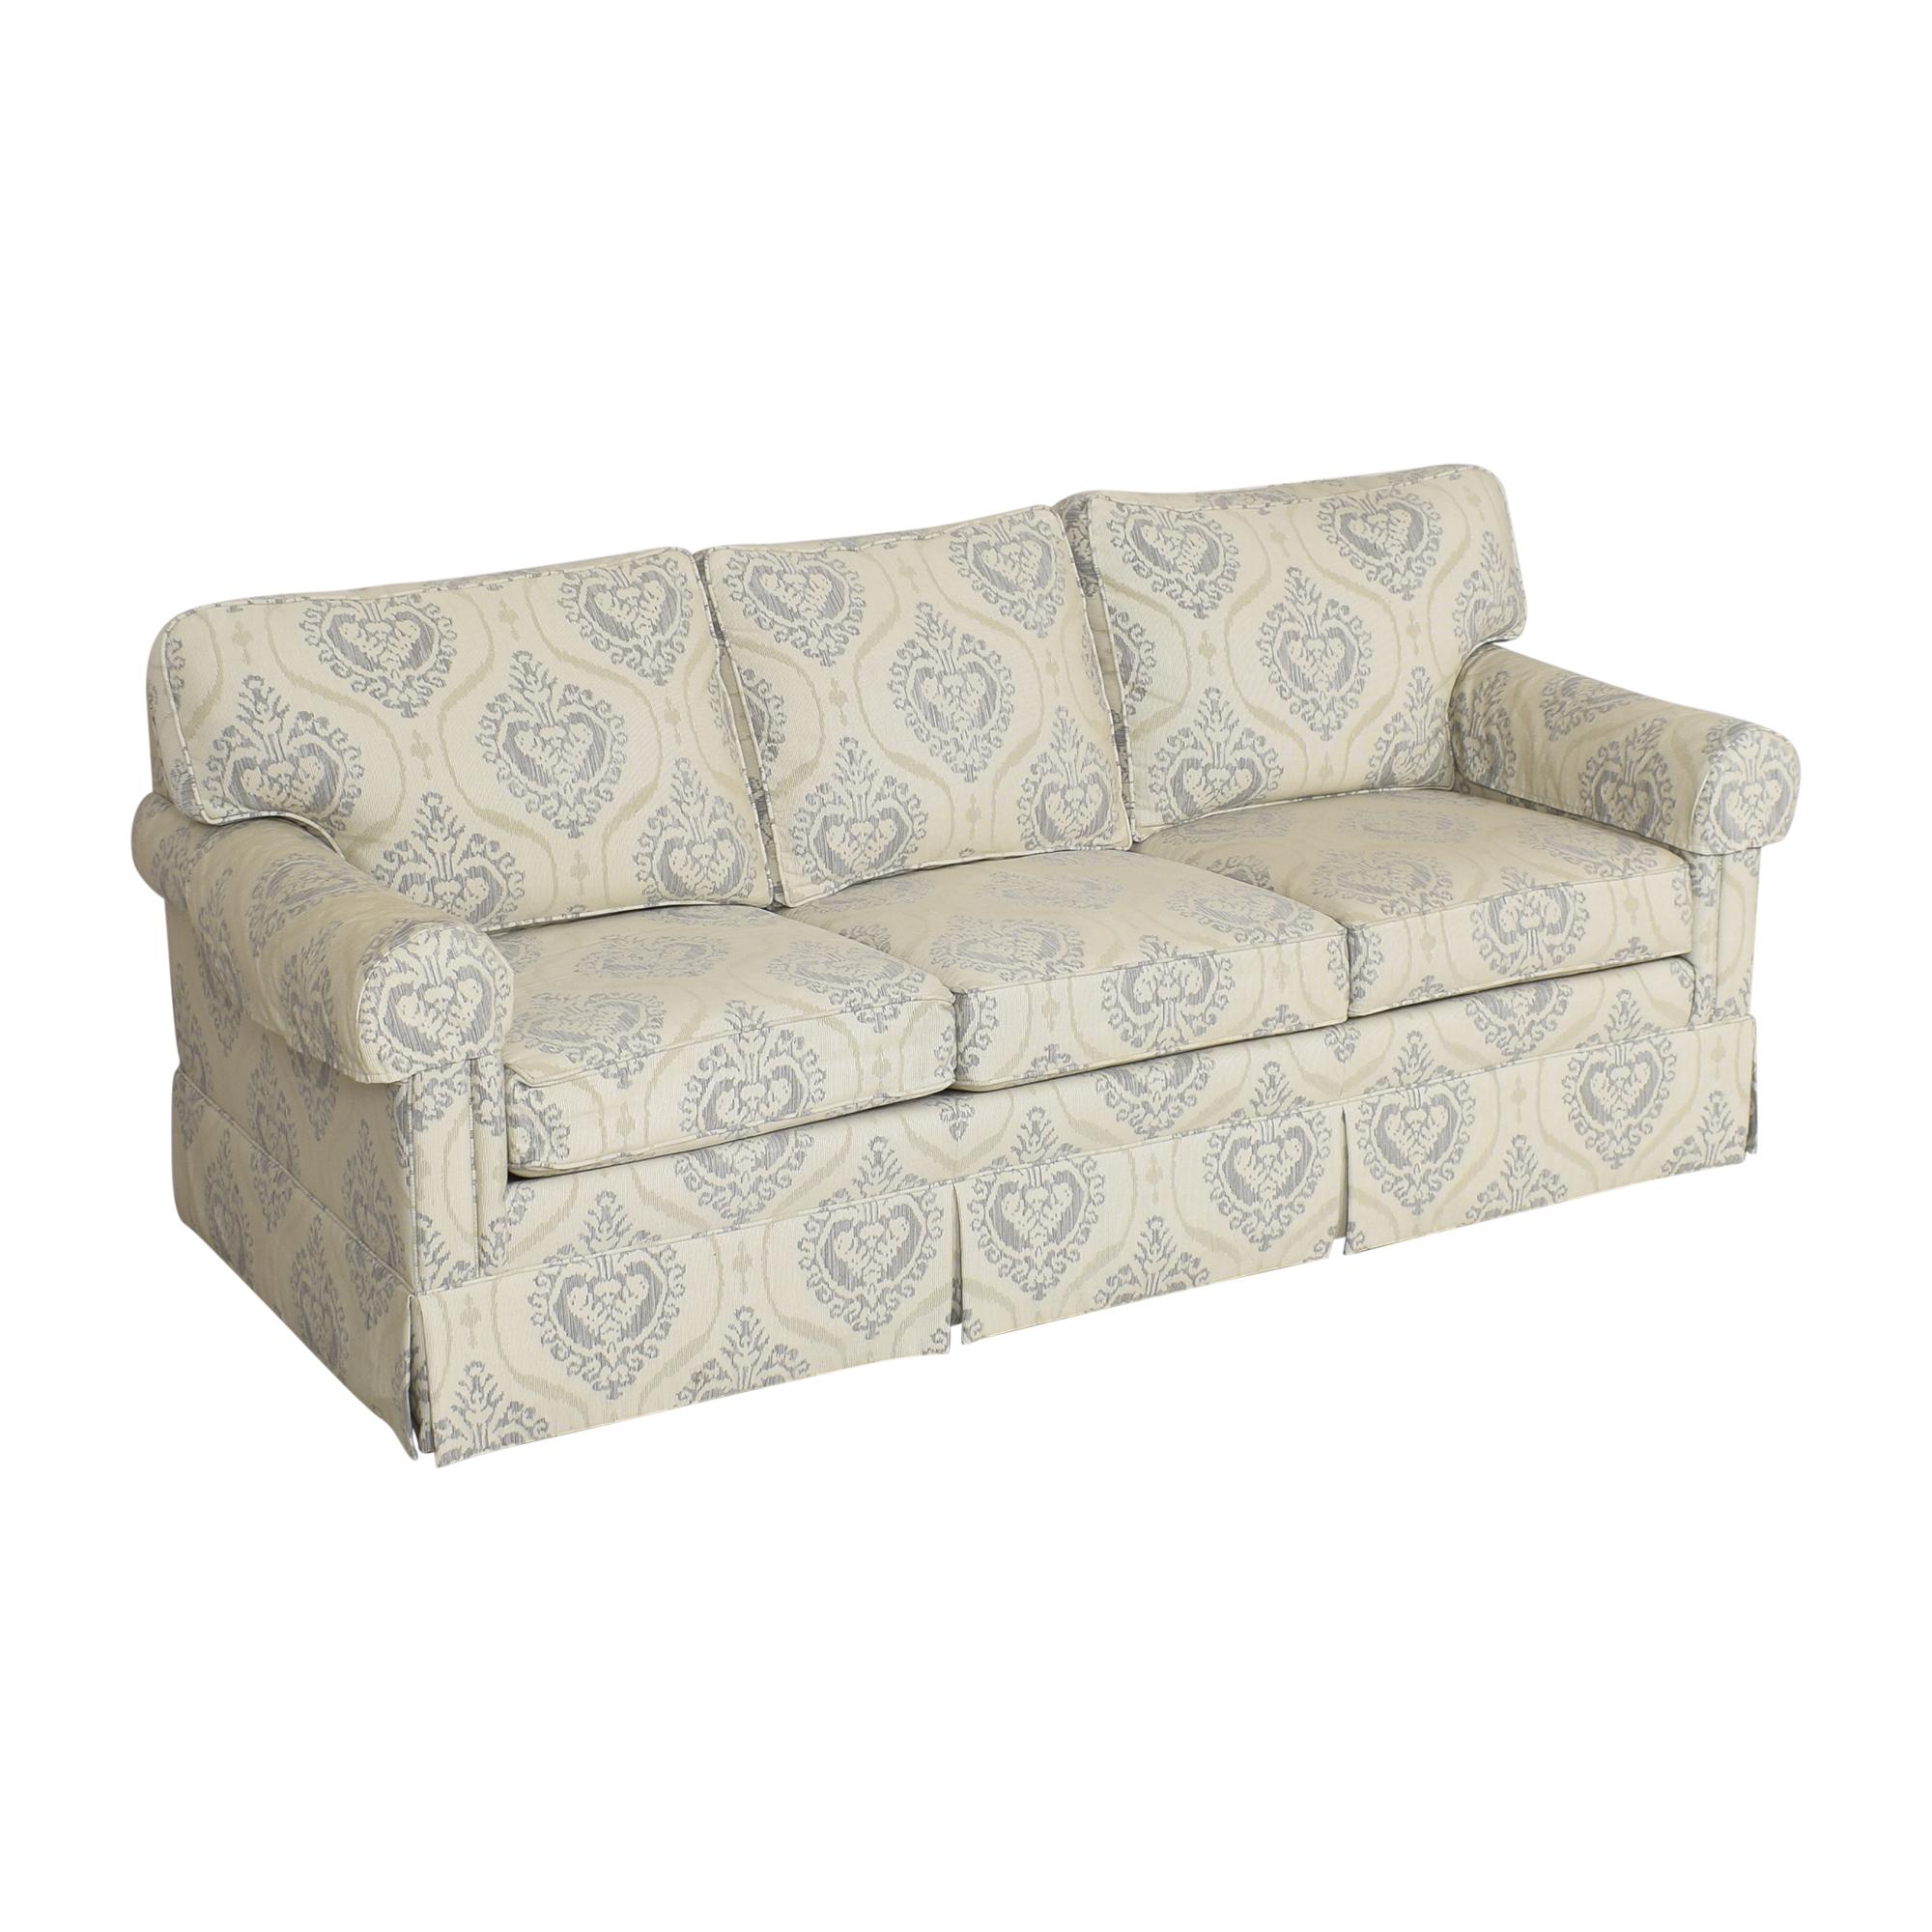 Ethan Allen Ethan Allen Three Cushion Skirted Sofa ma